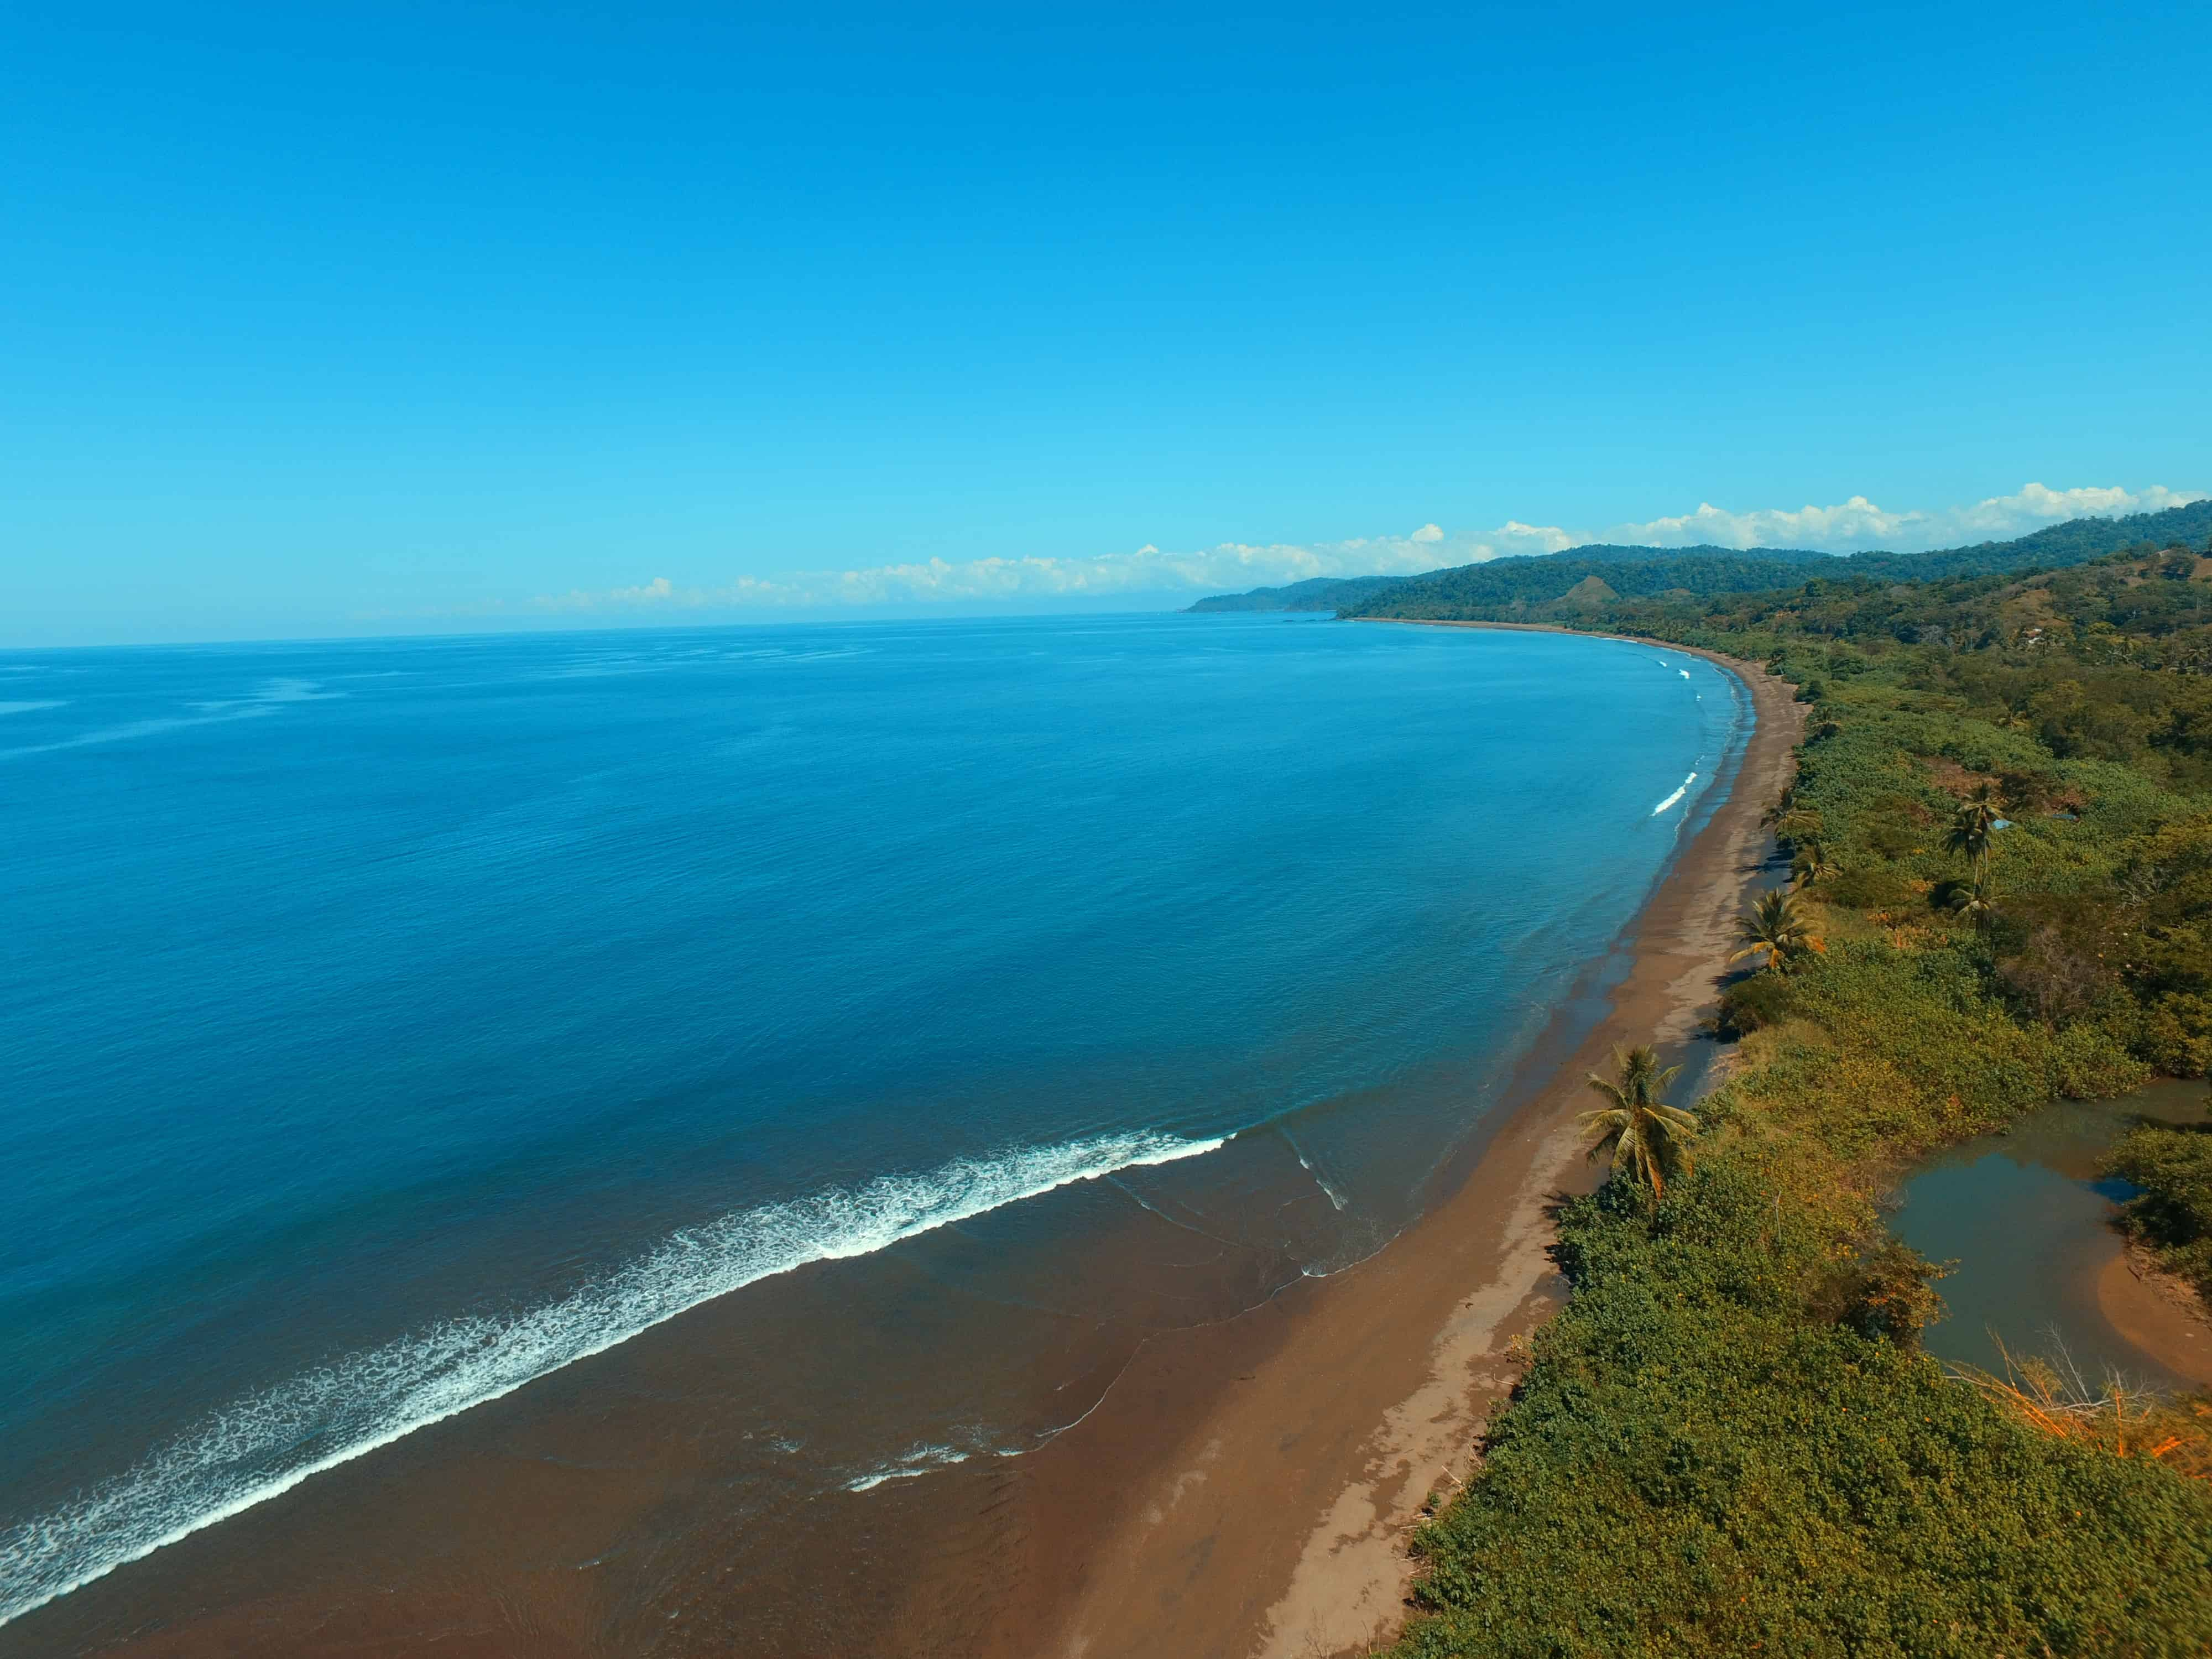 Rondreis Costa Rica Drake Bay